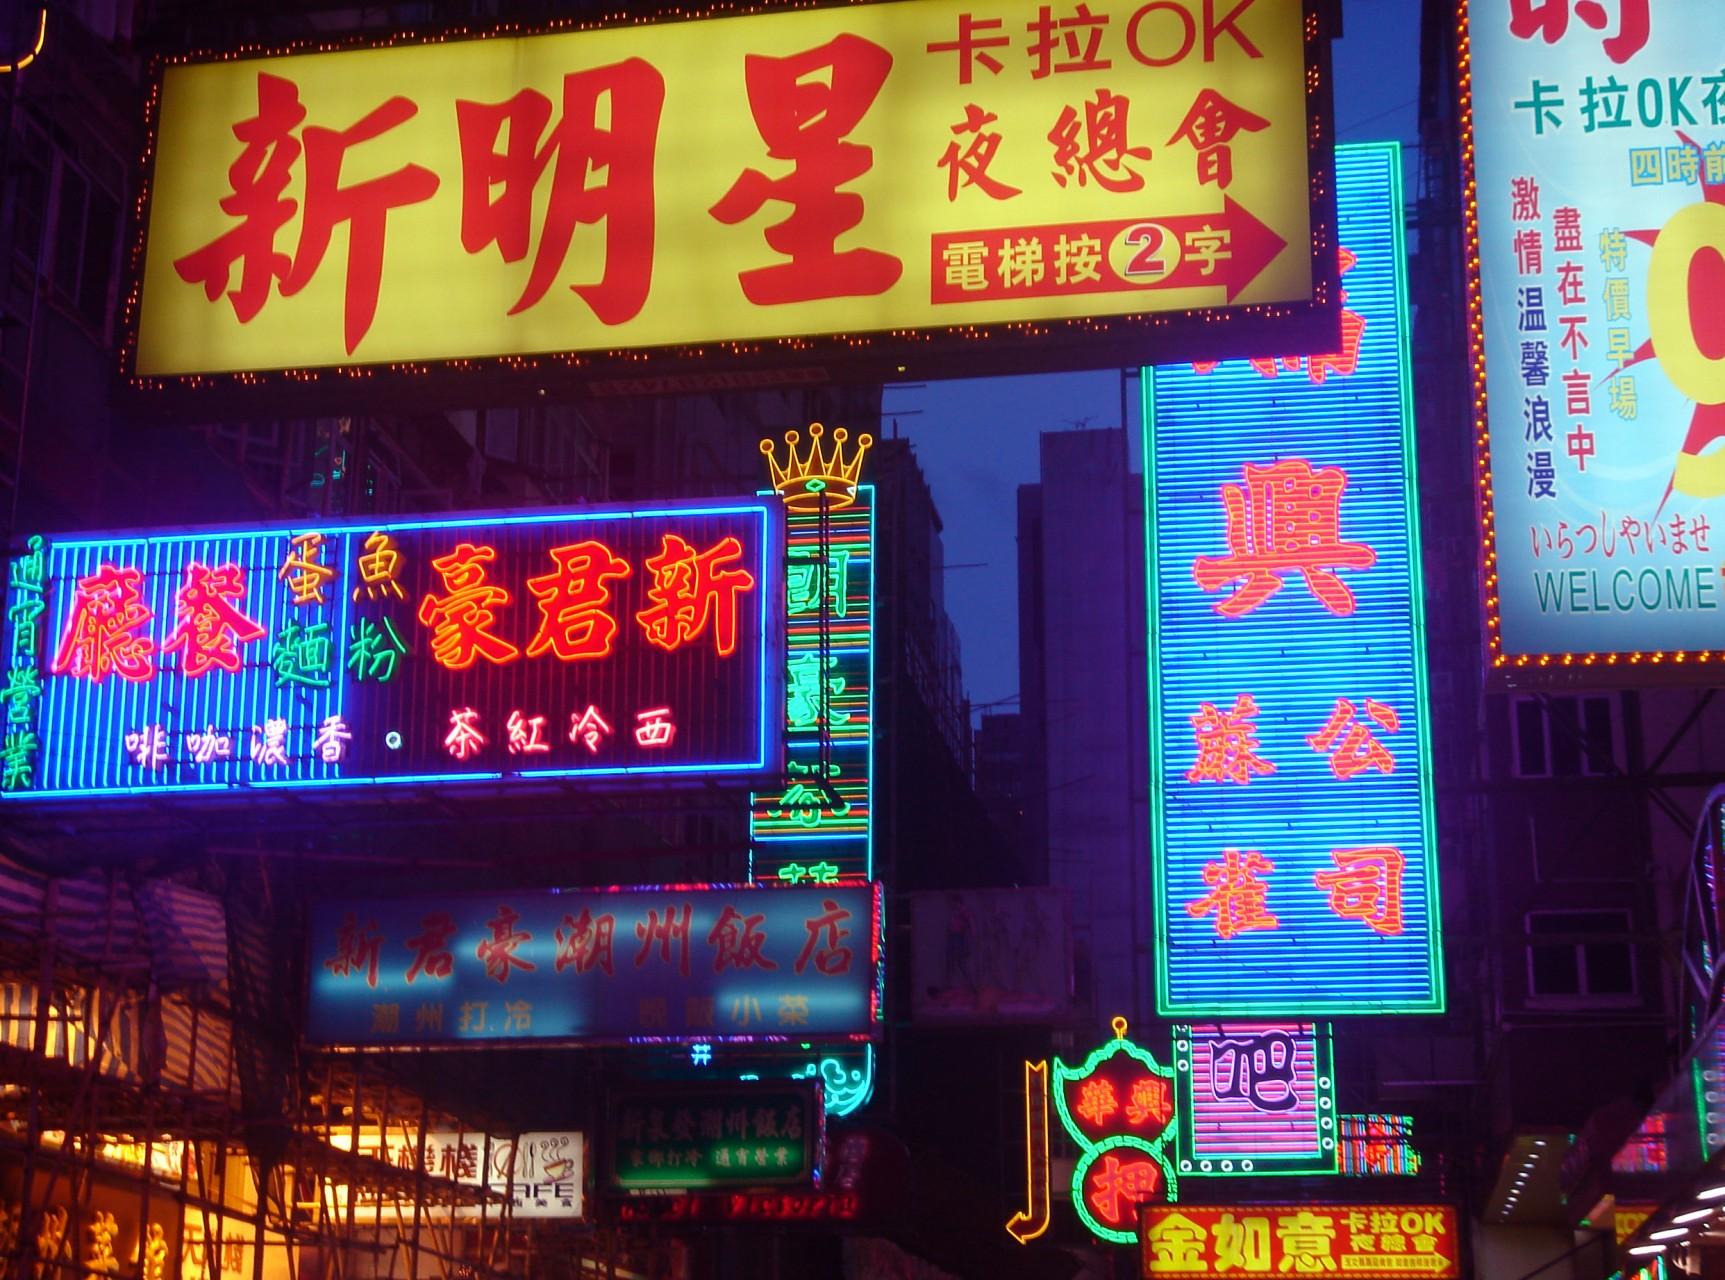 Hong Kong - 2006